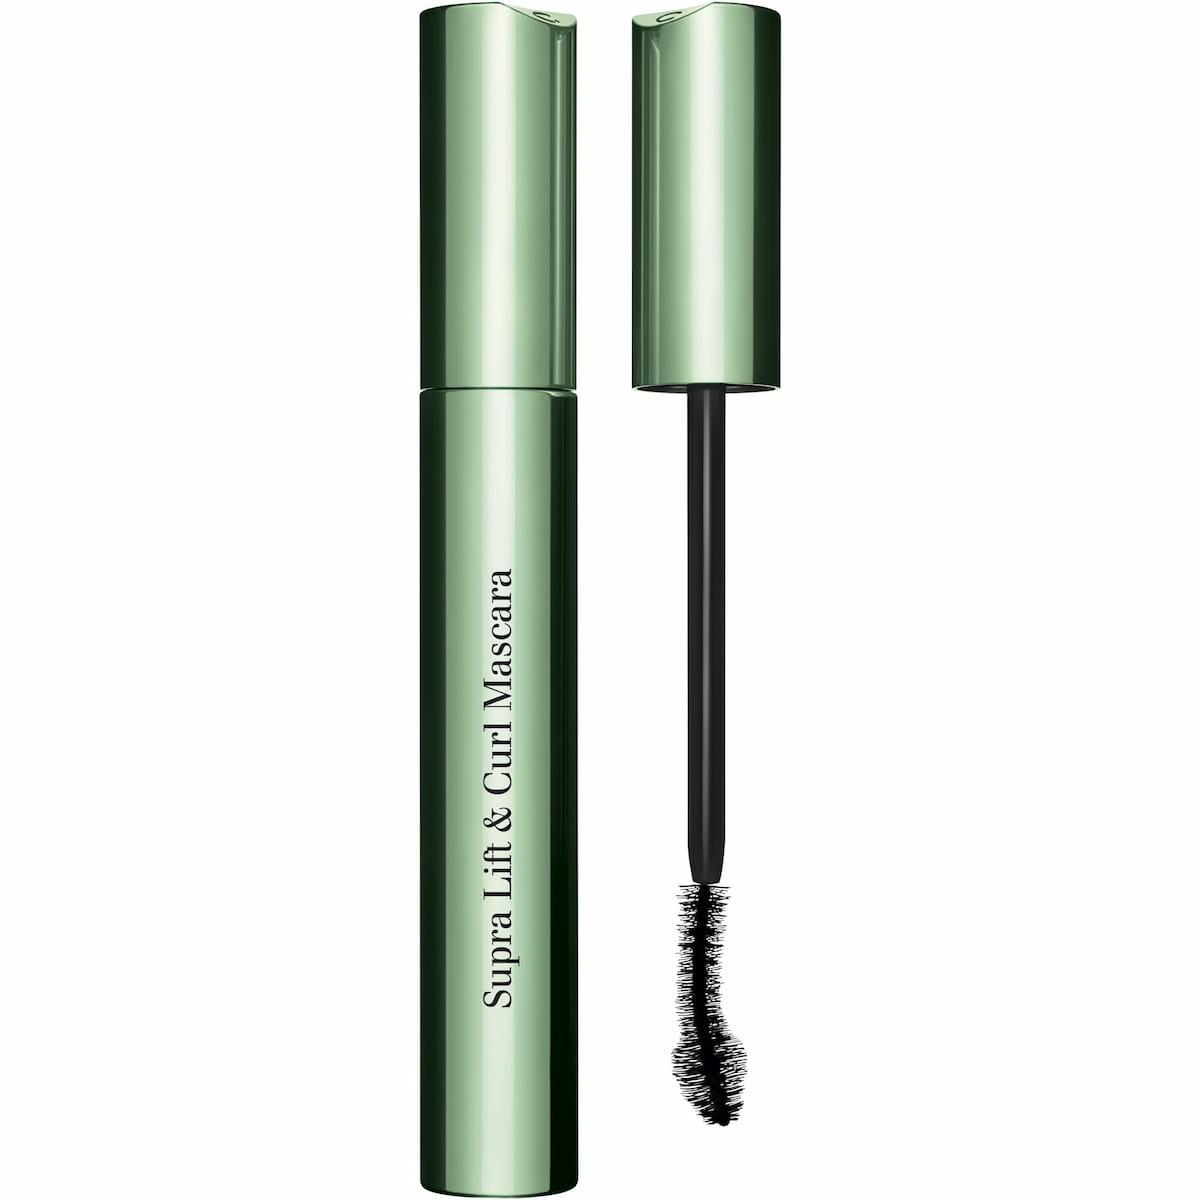 Clarins - Mascara Supra Lift & Curl - Effet Liftant Courbe & Volume Déployés